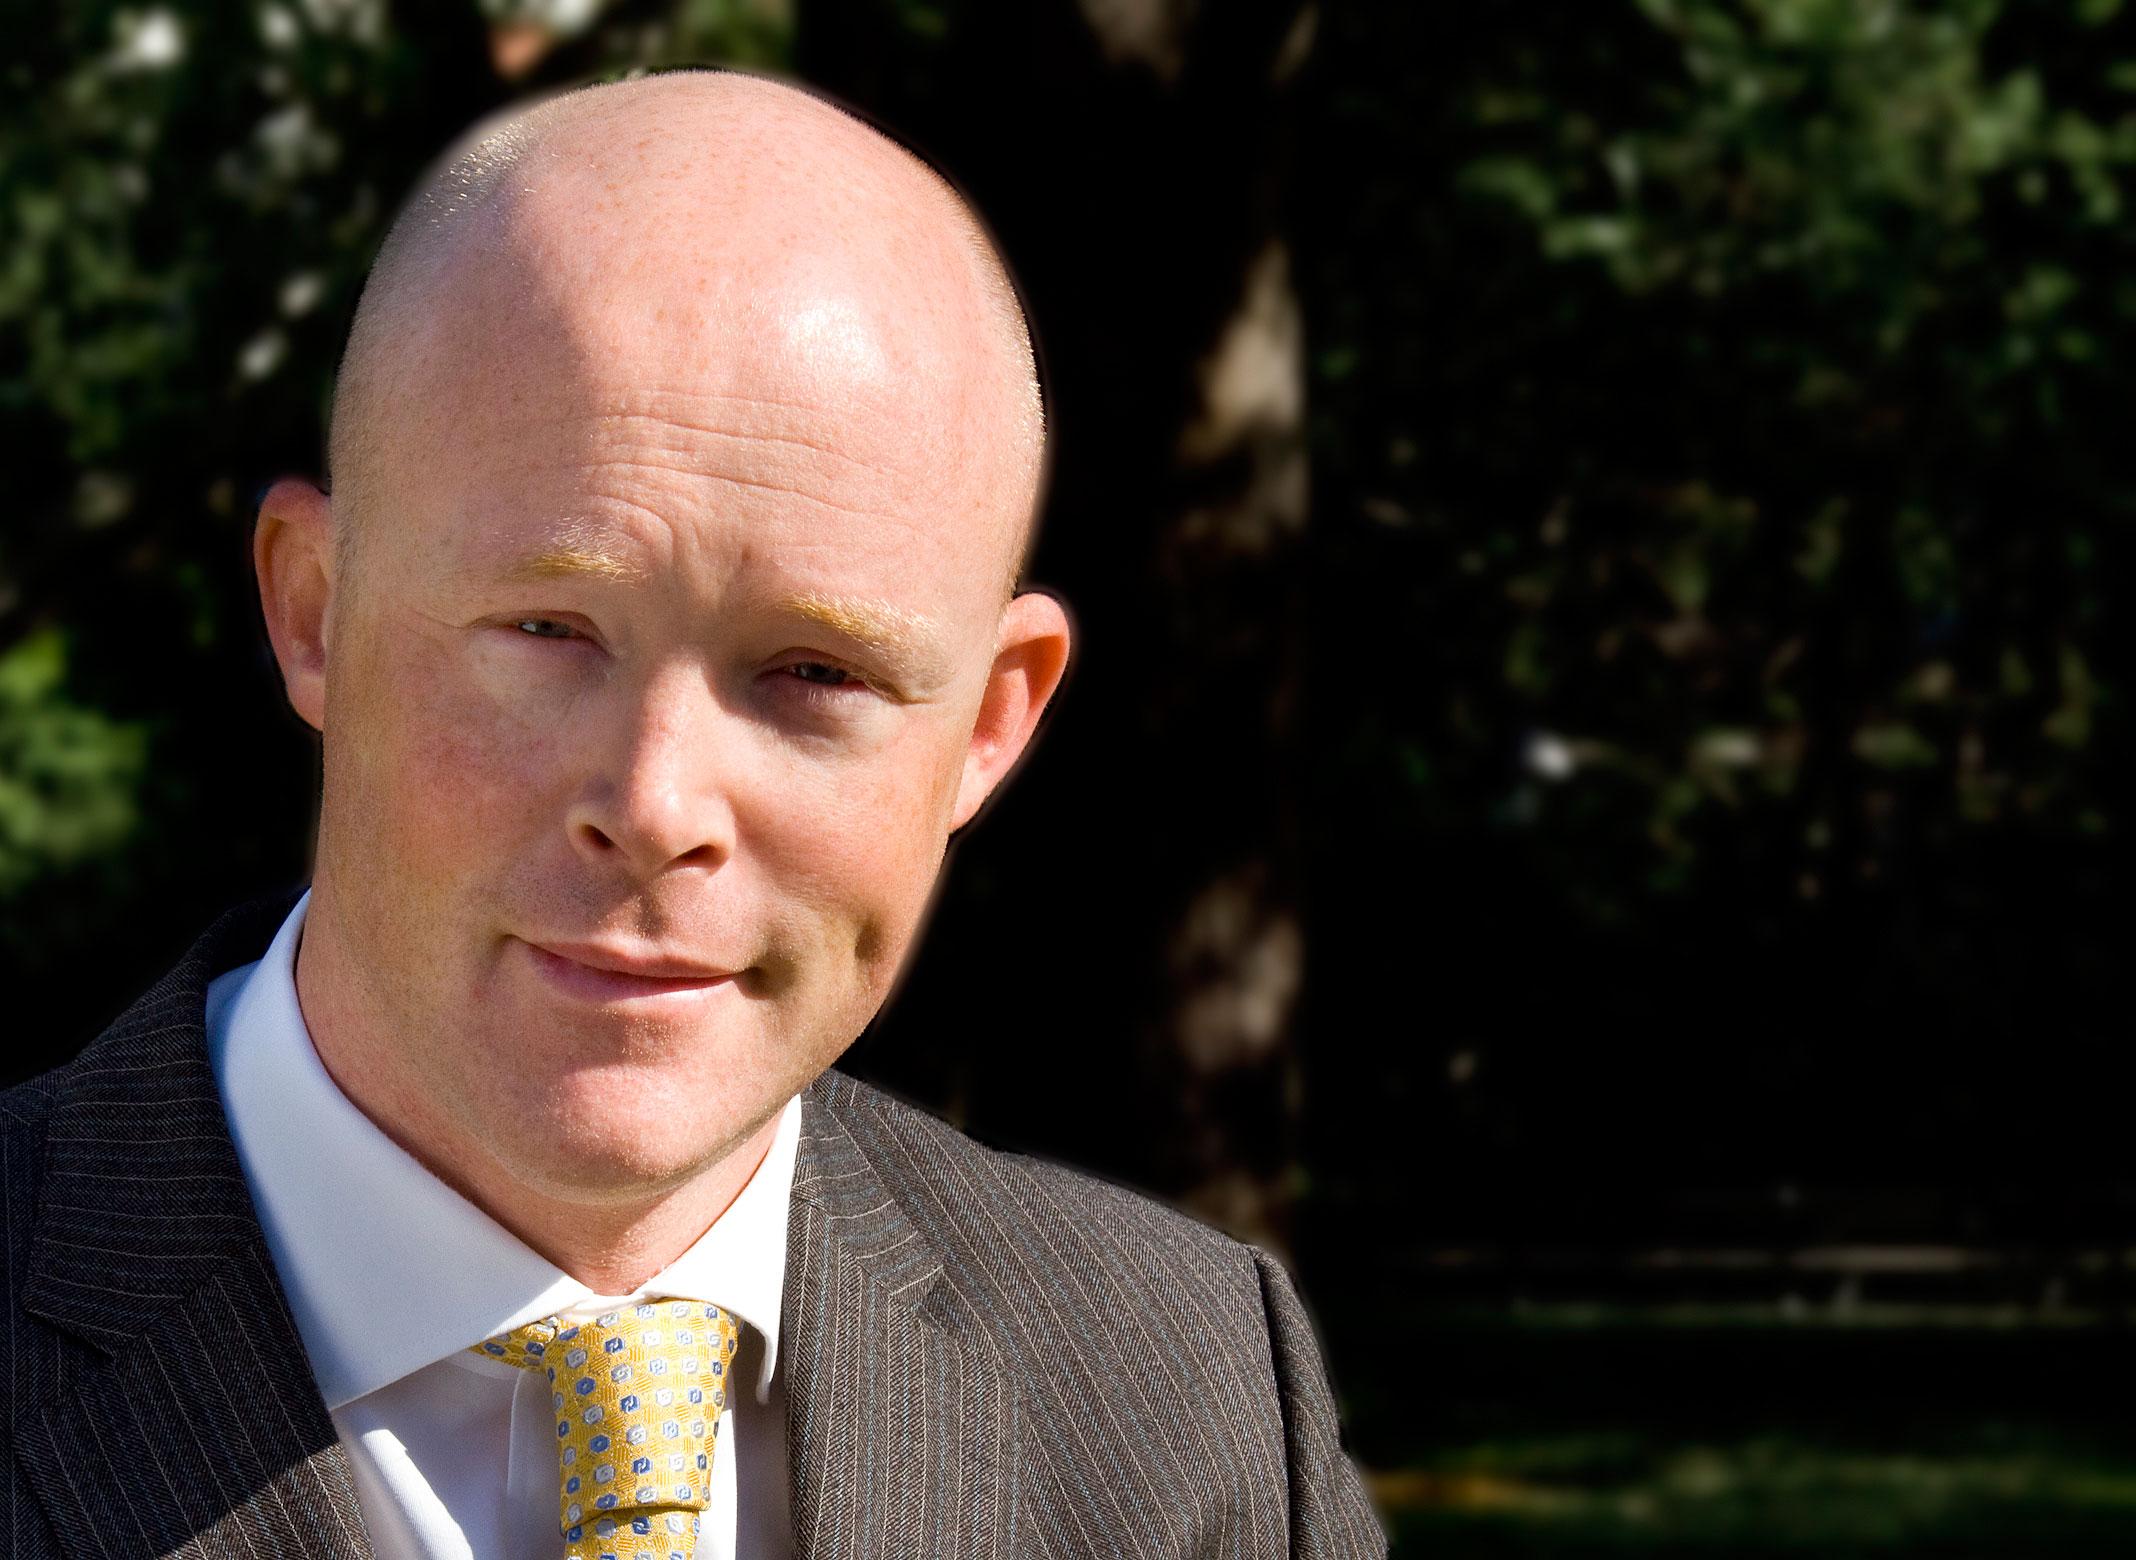 Andrew Barnard, Deputy Managing Director Of The Body Holiday